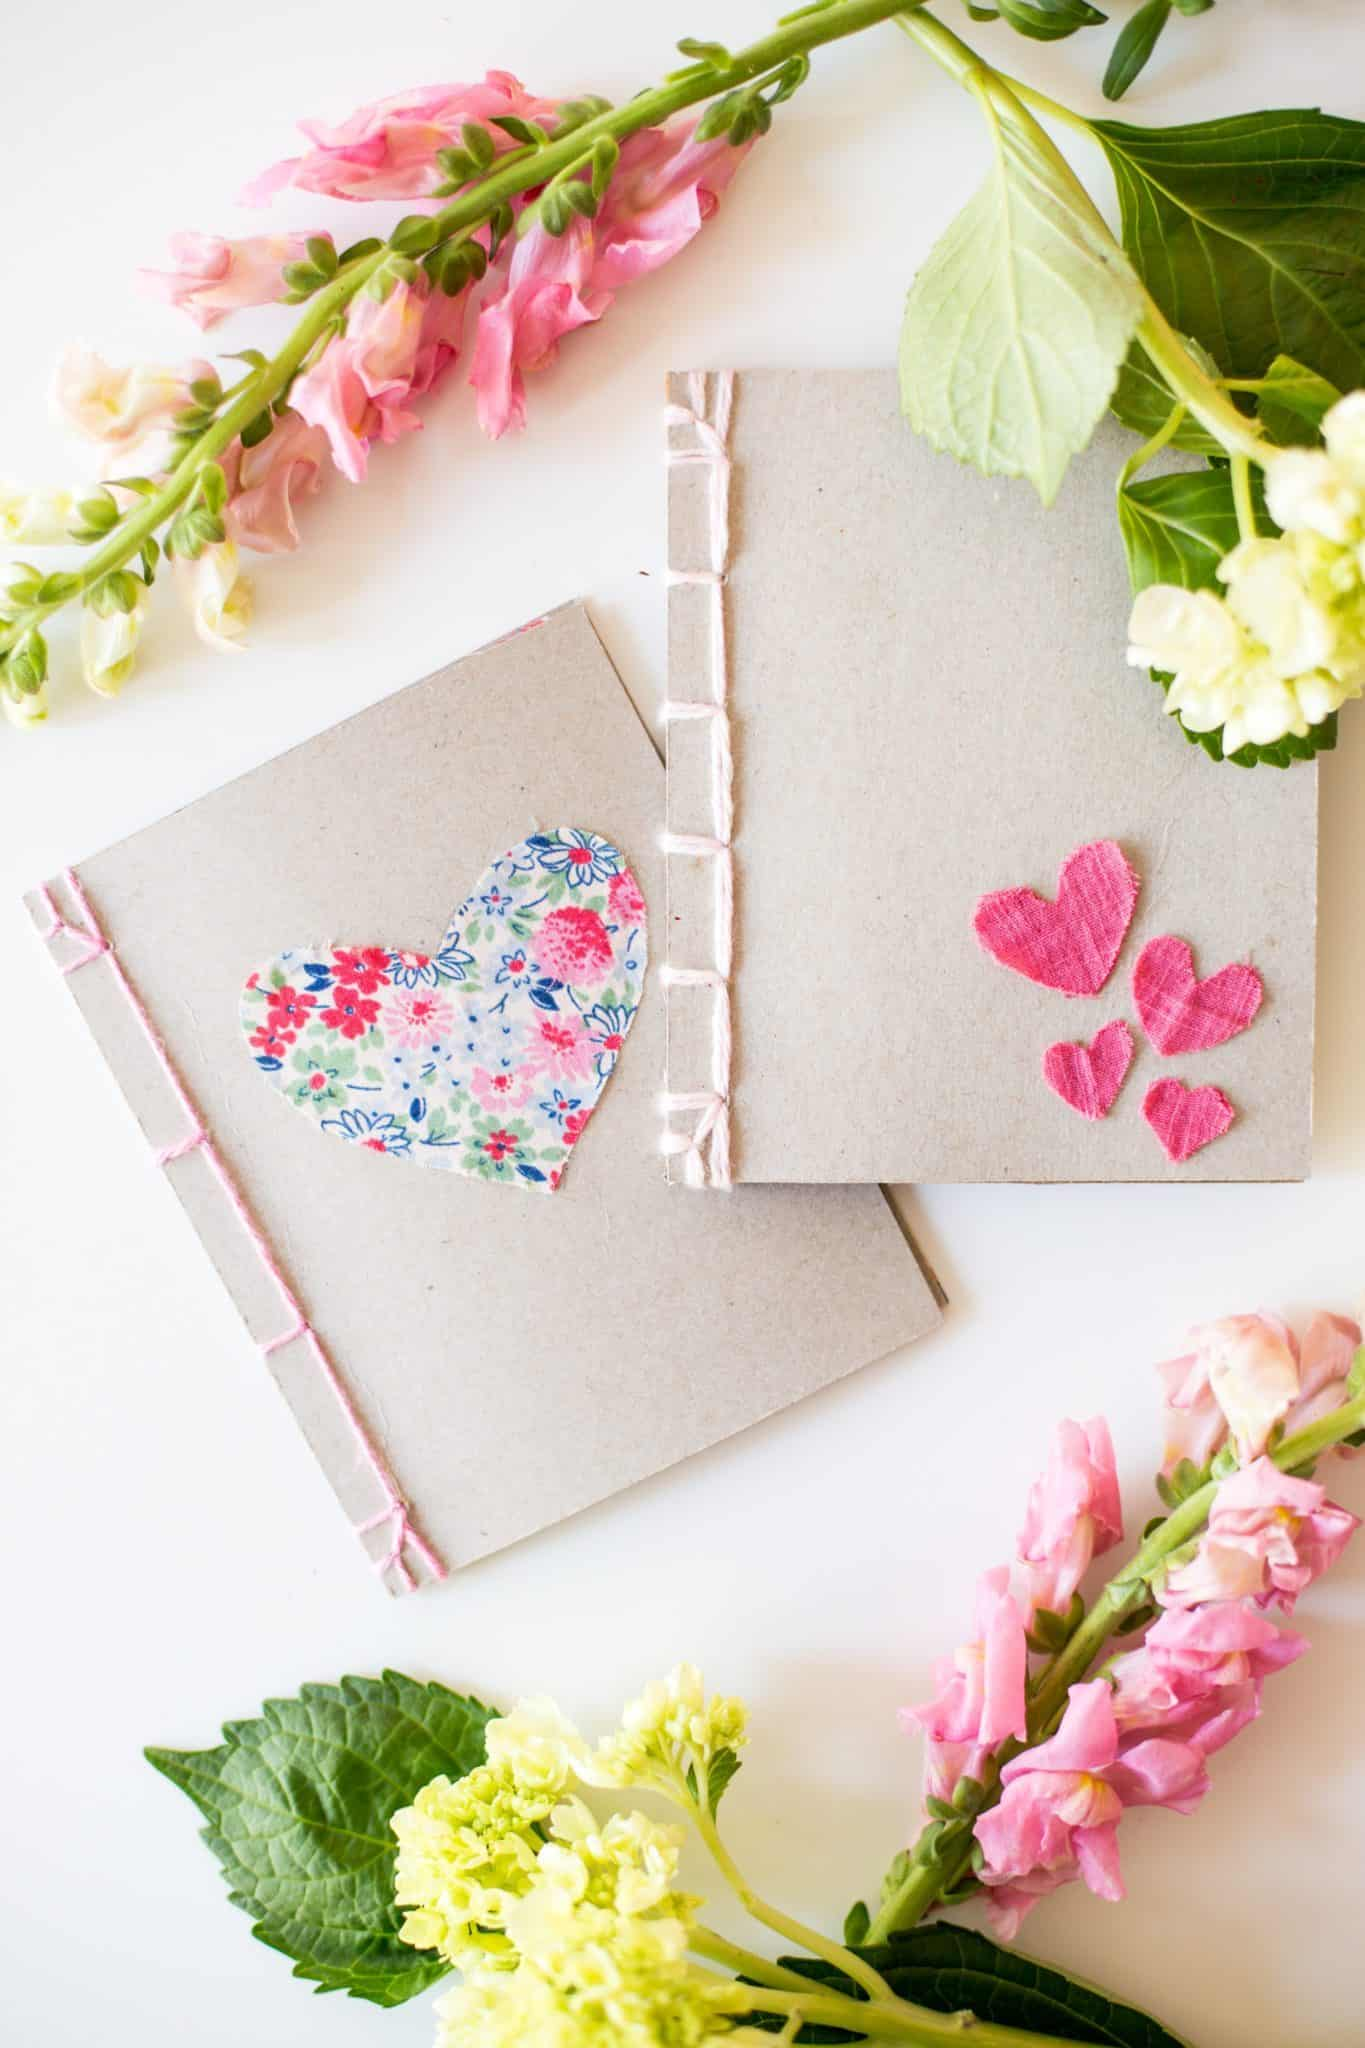 Stitching and fabric notebook